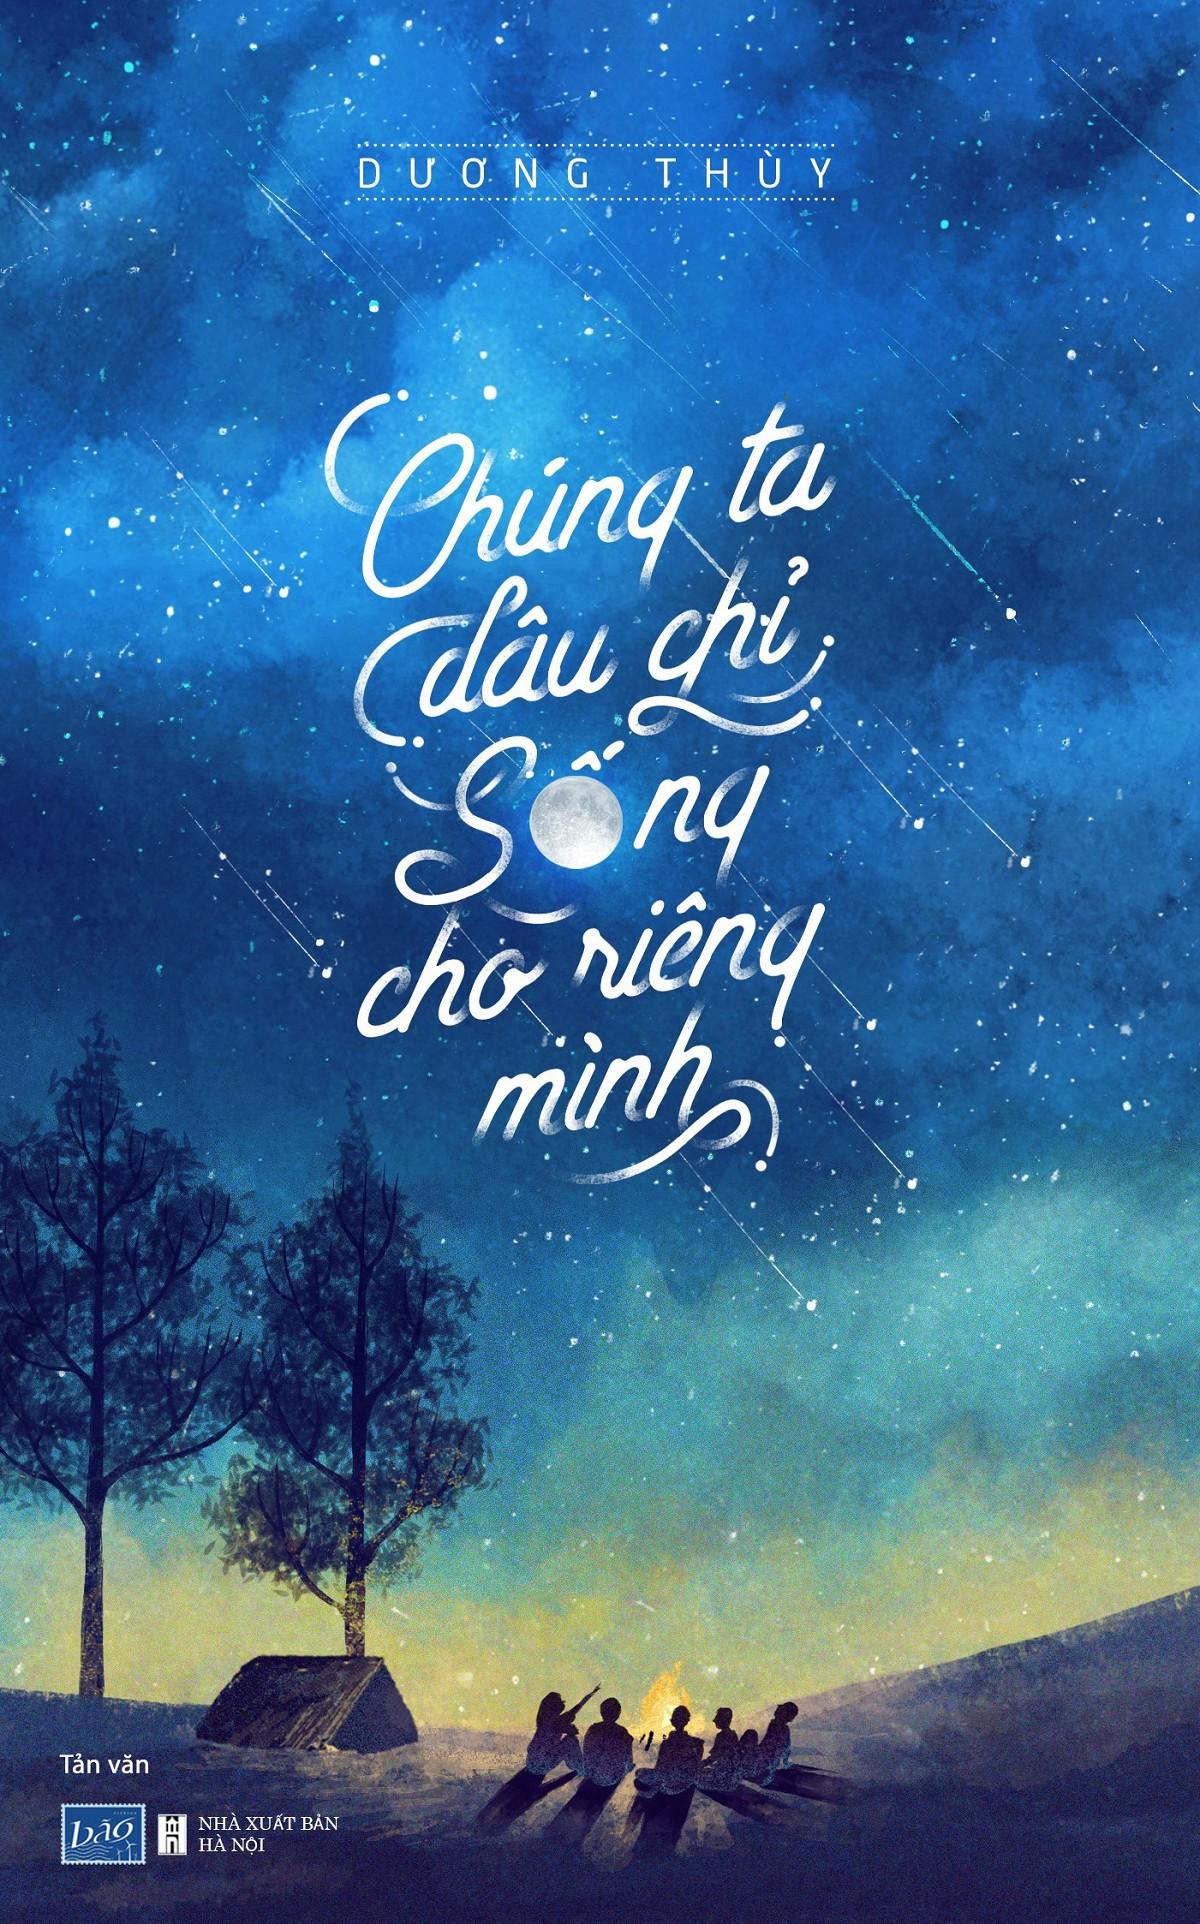 bia-1_chung-ta-dau-chi-song-cho-rieng-minh.u2487.d20170113.t114537.41751.jpg